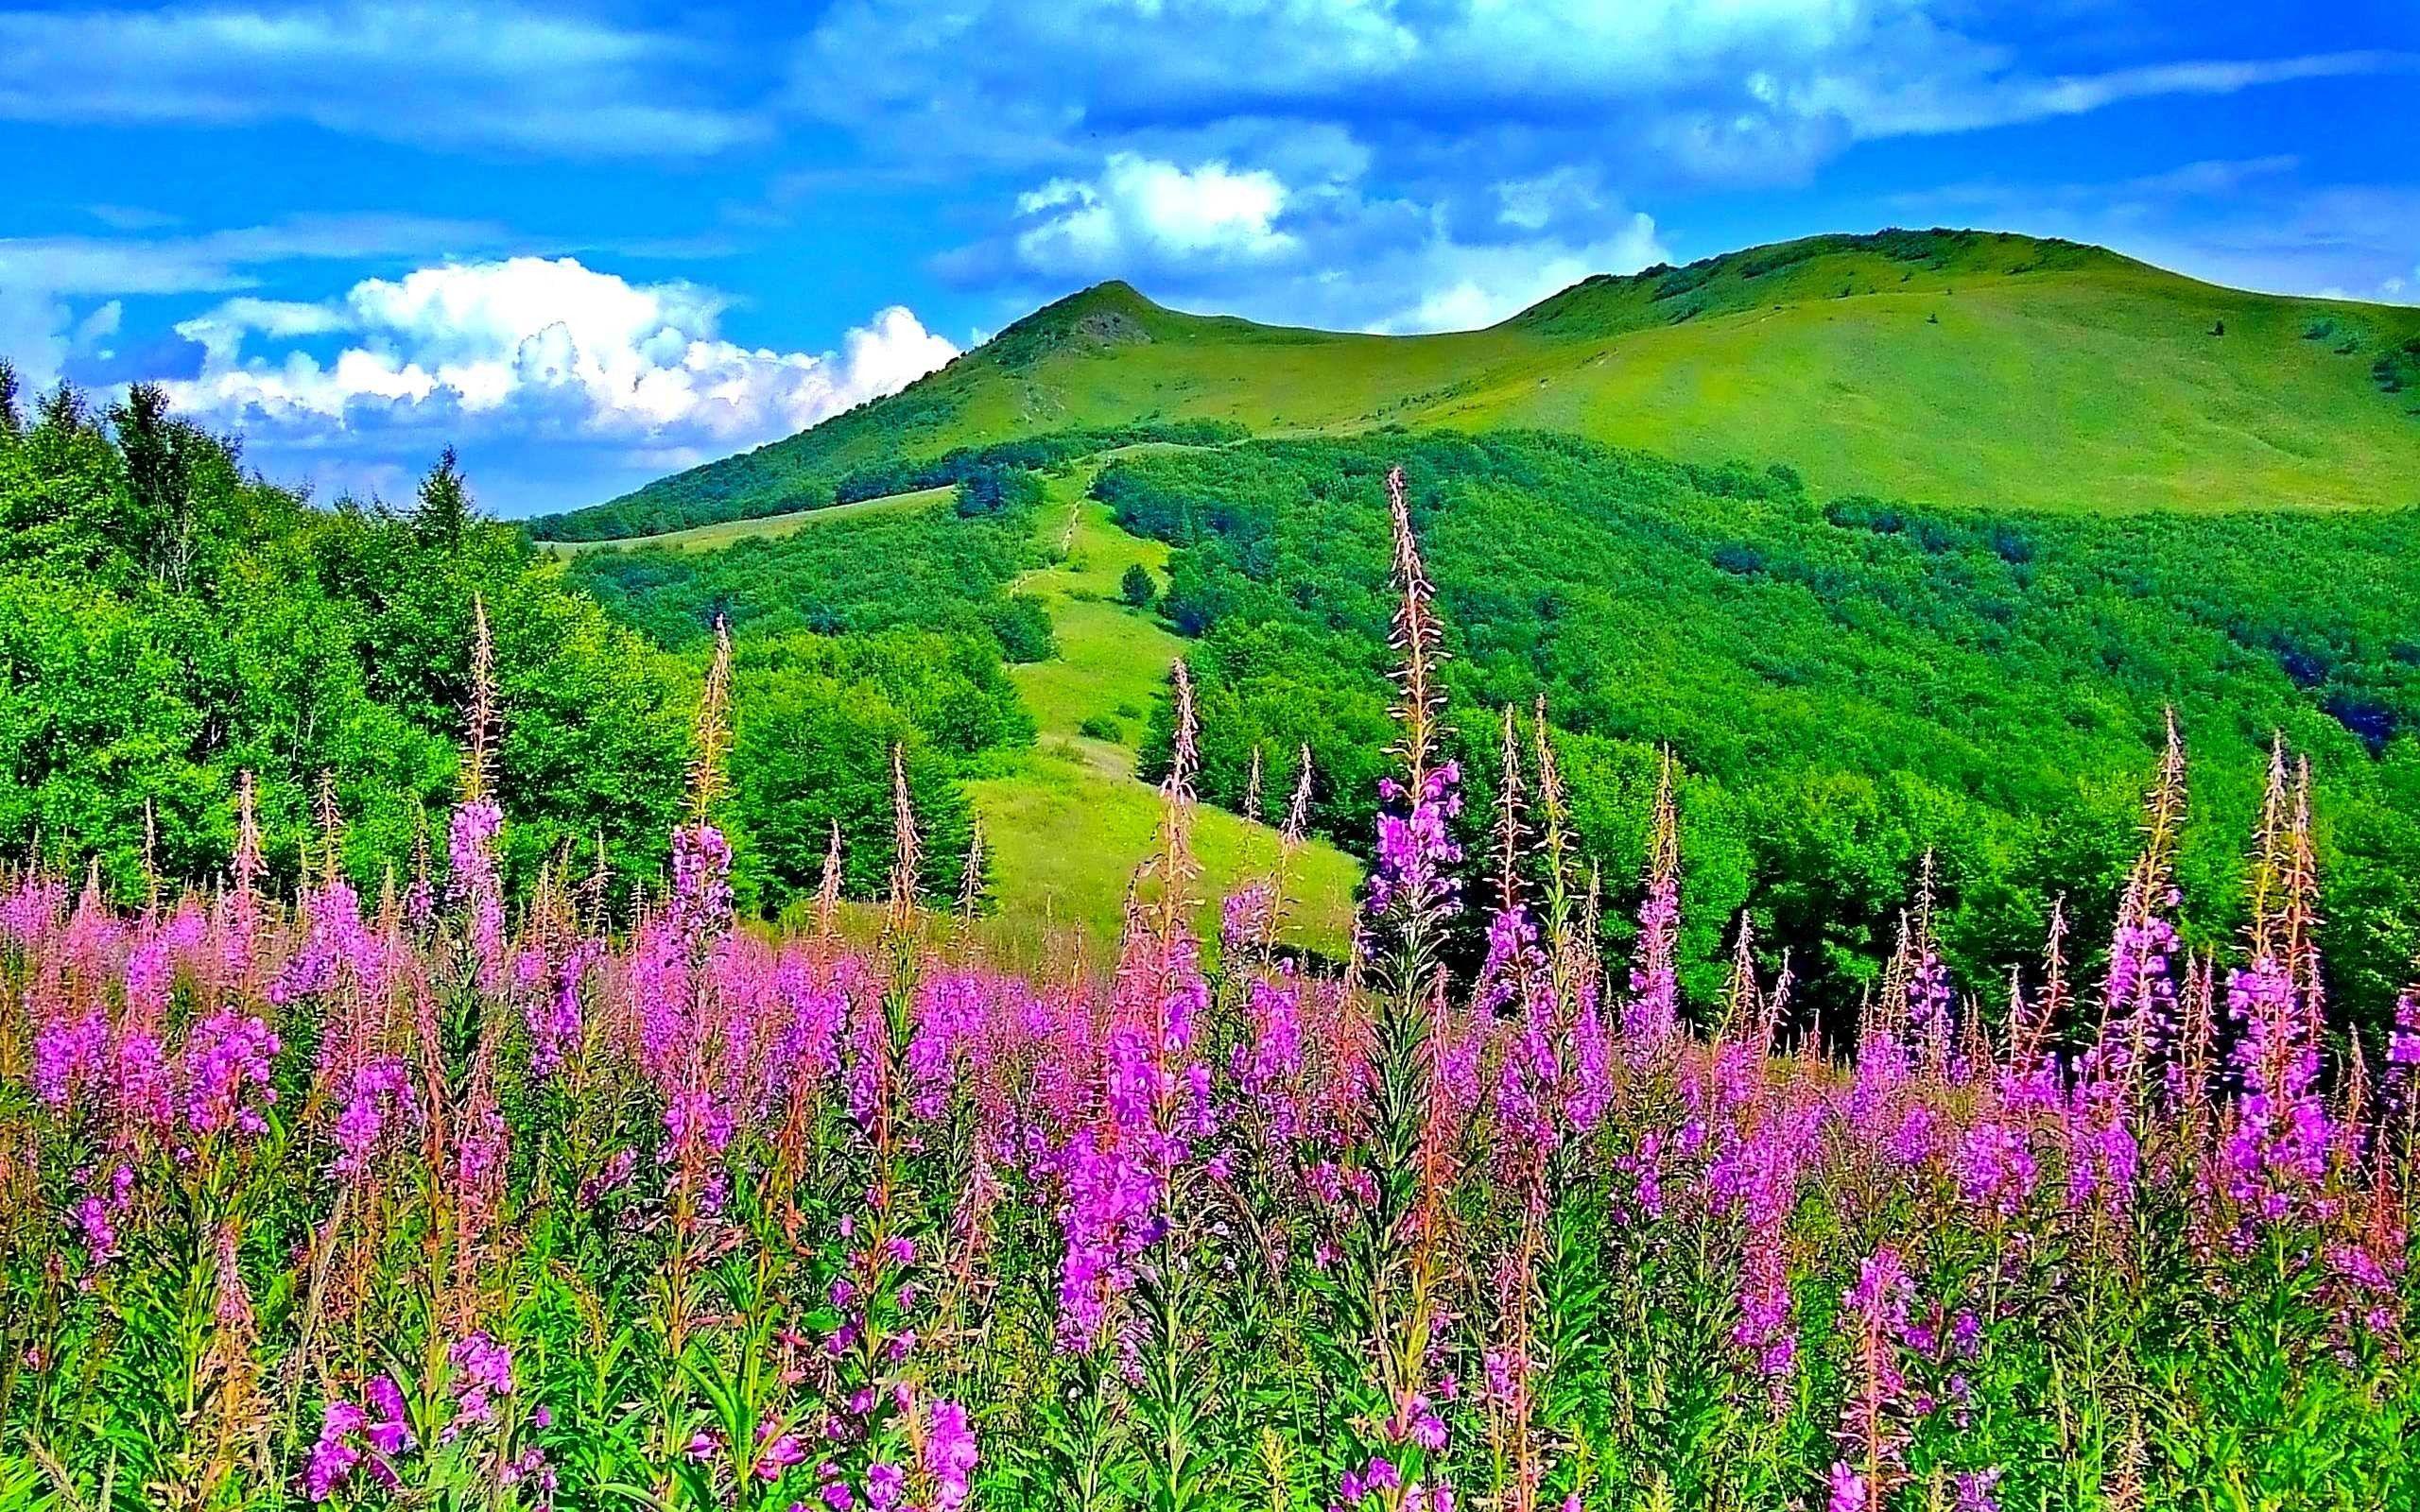 Beautiful Nature Spring Hd Desktop 10 HD Wallpapers 2560x1600